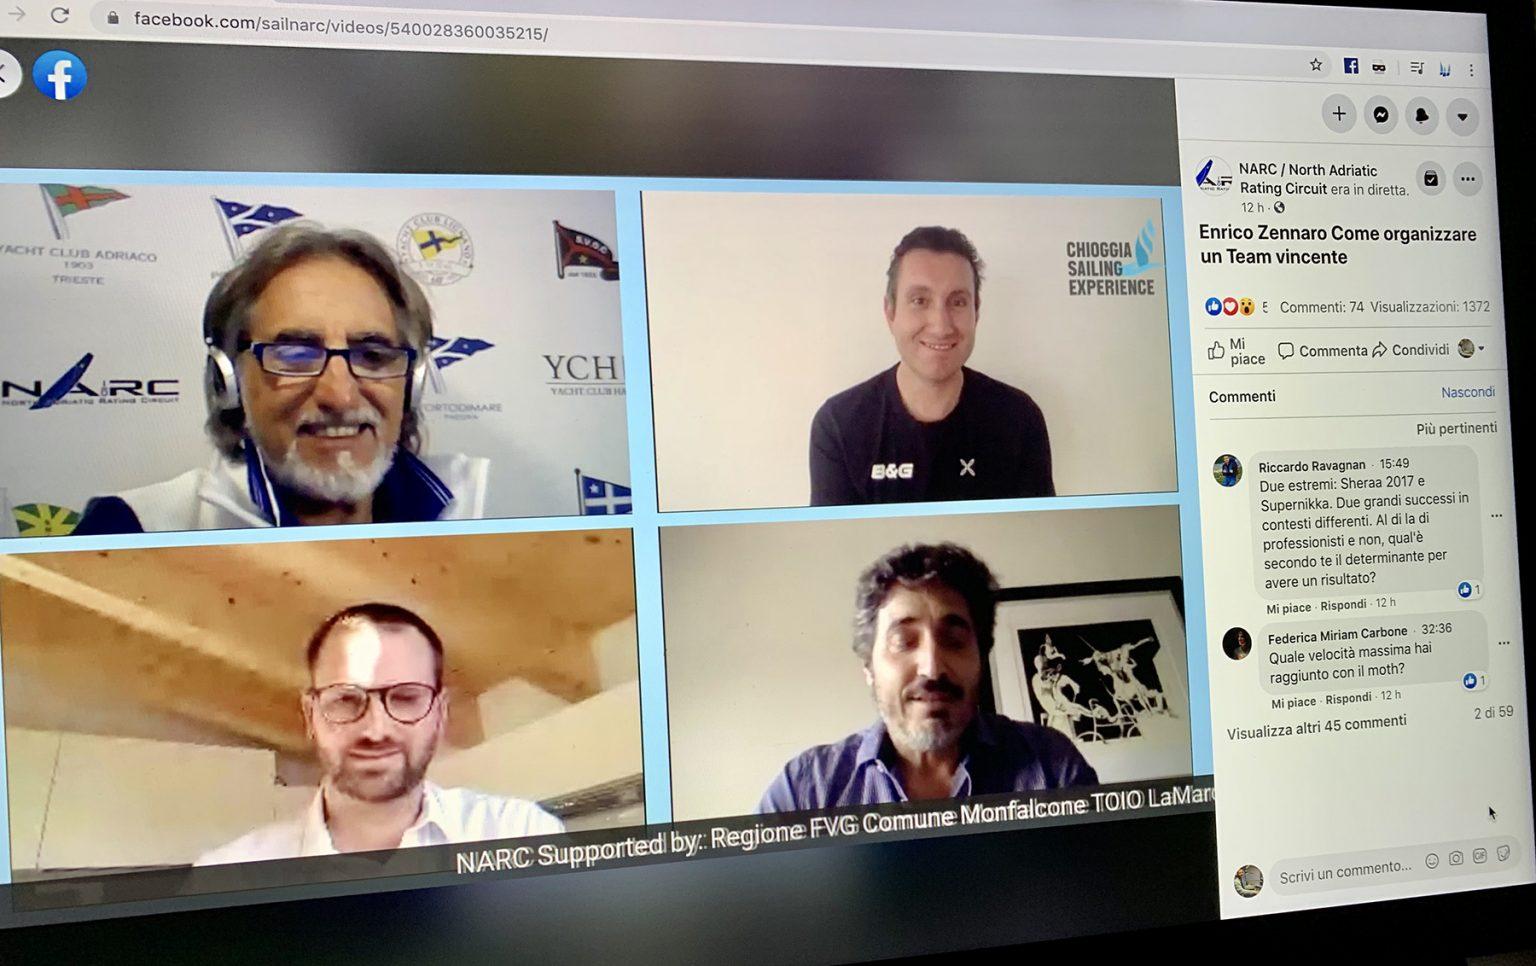 'Come organizzare un team vincente'. Il webinar con Enrico Zennaro